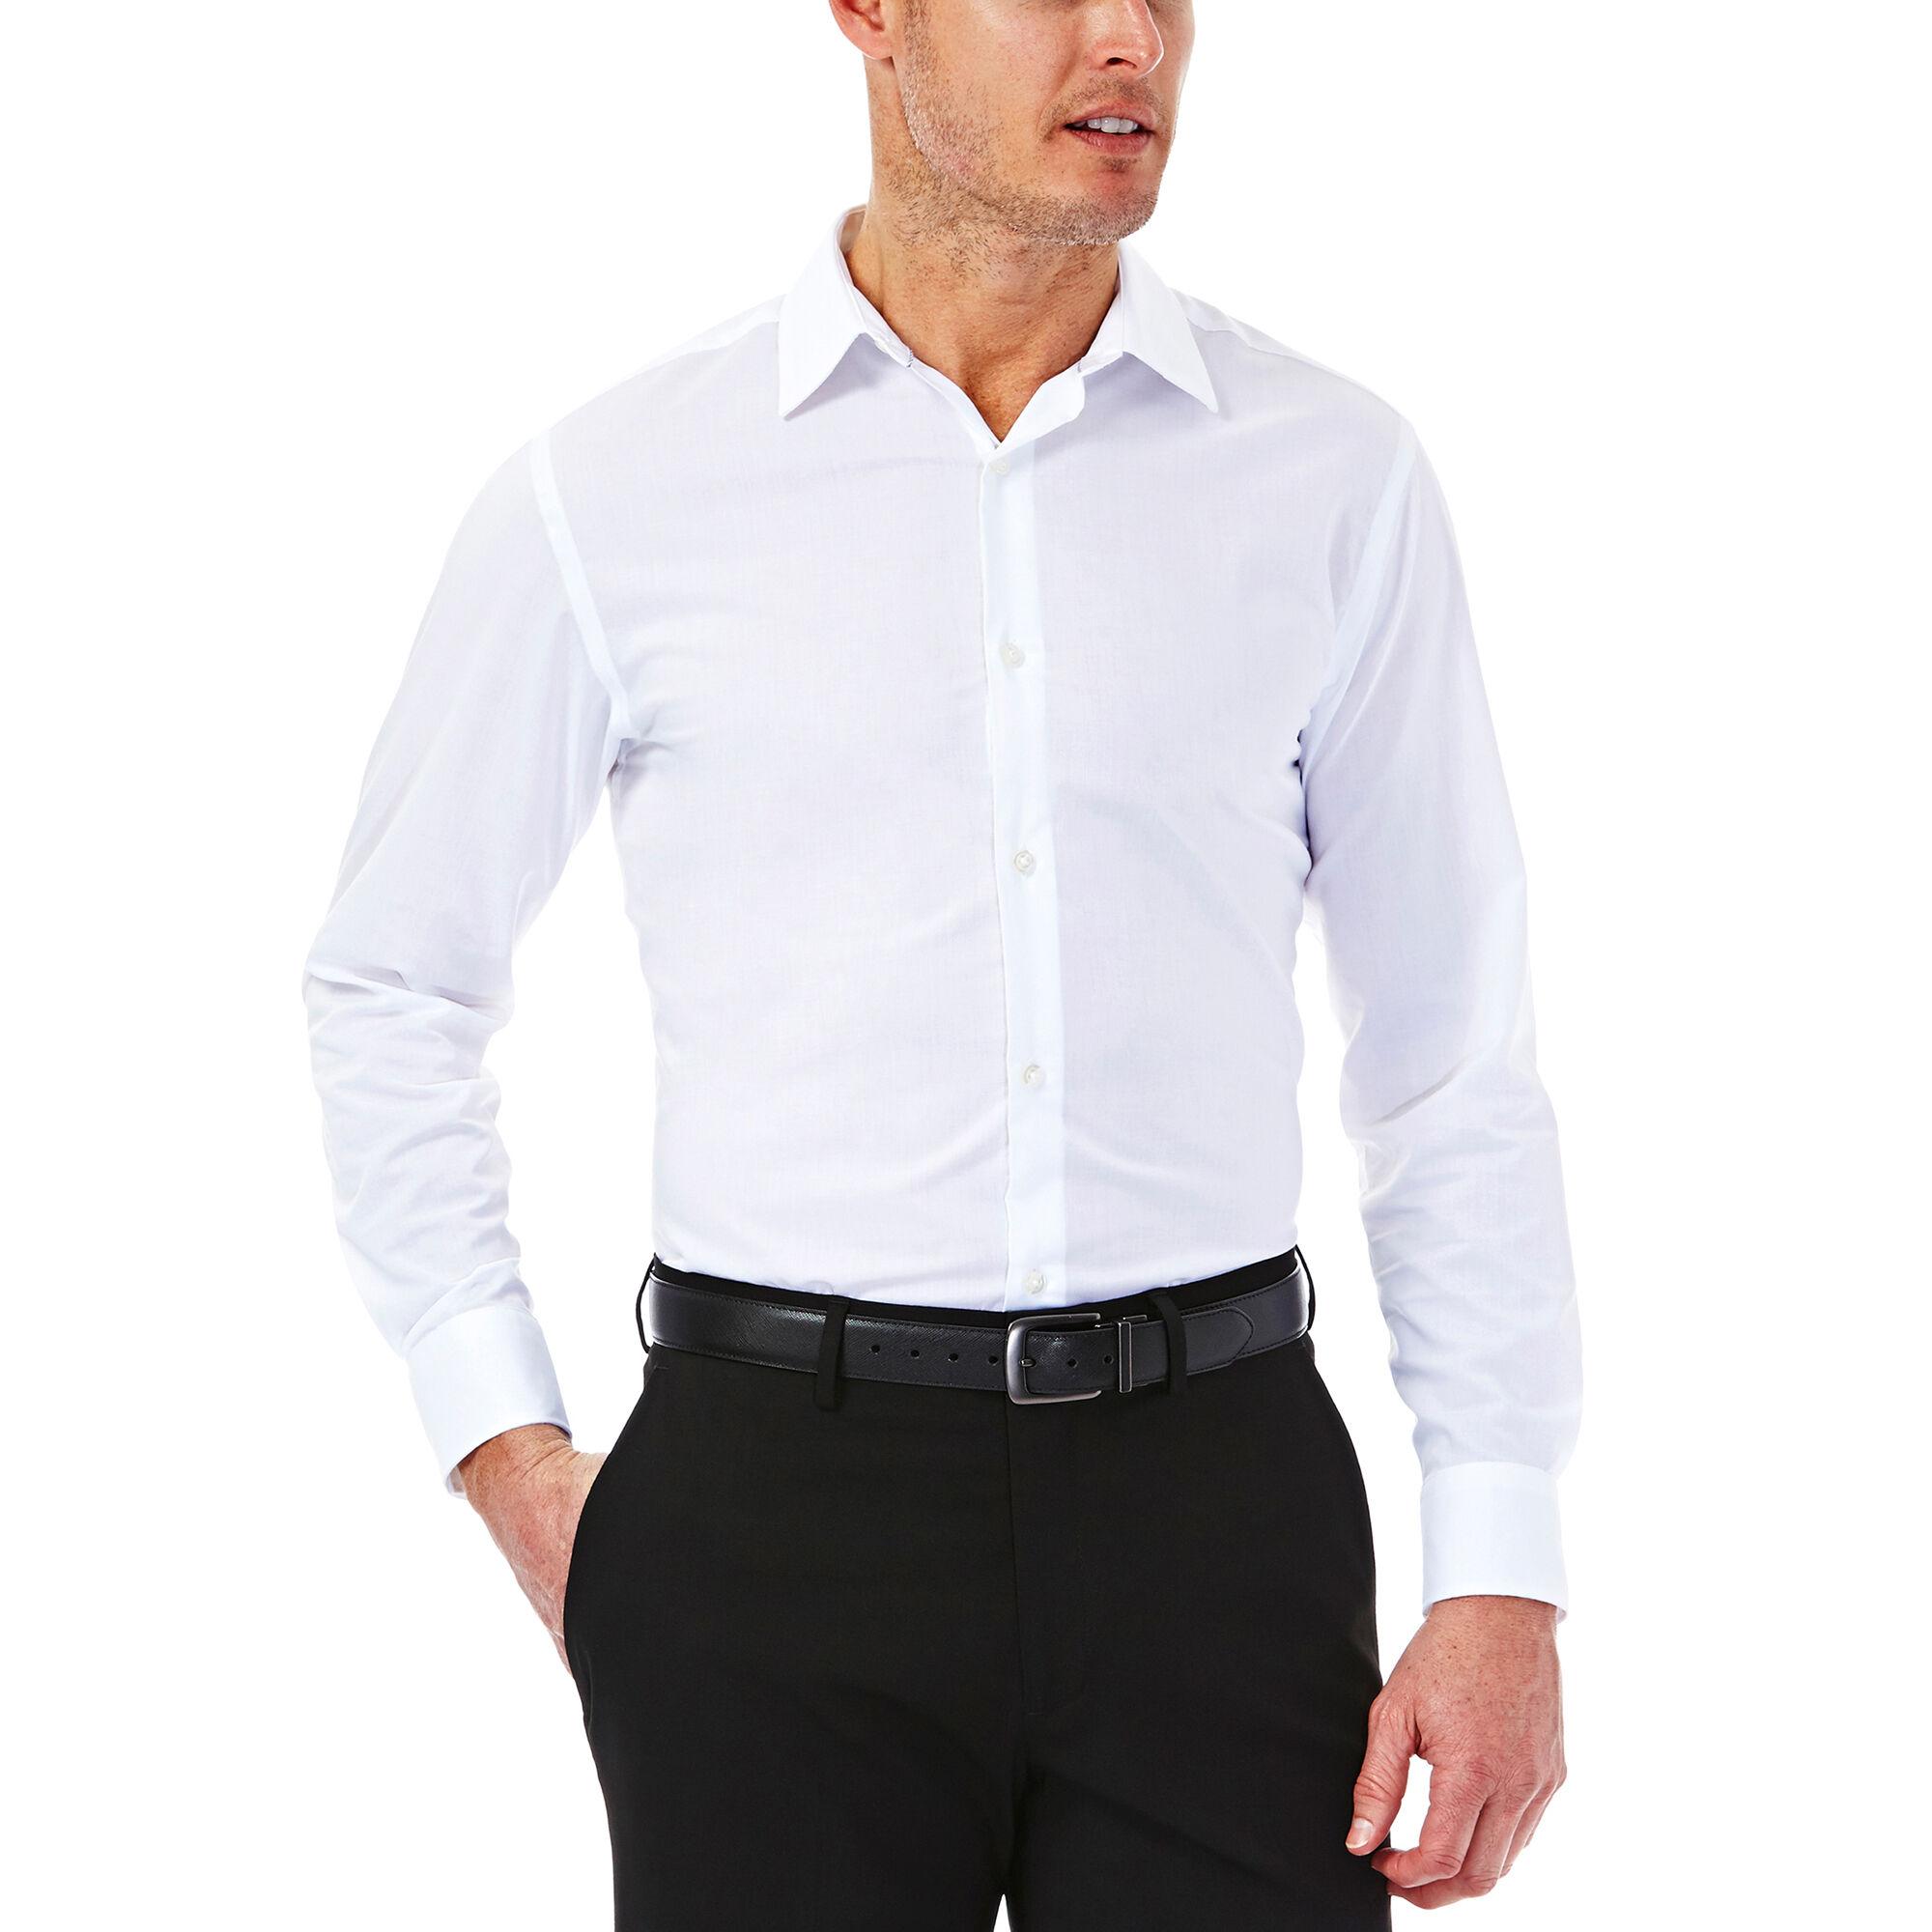 Solid Oxford Dress Shirt